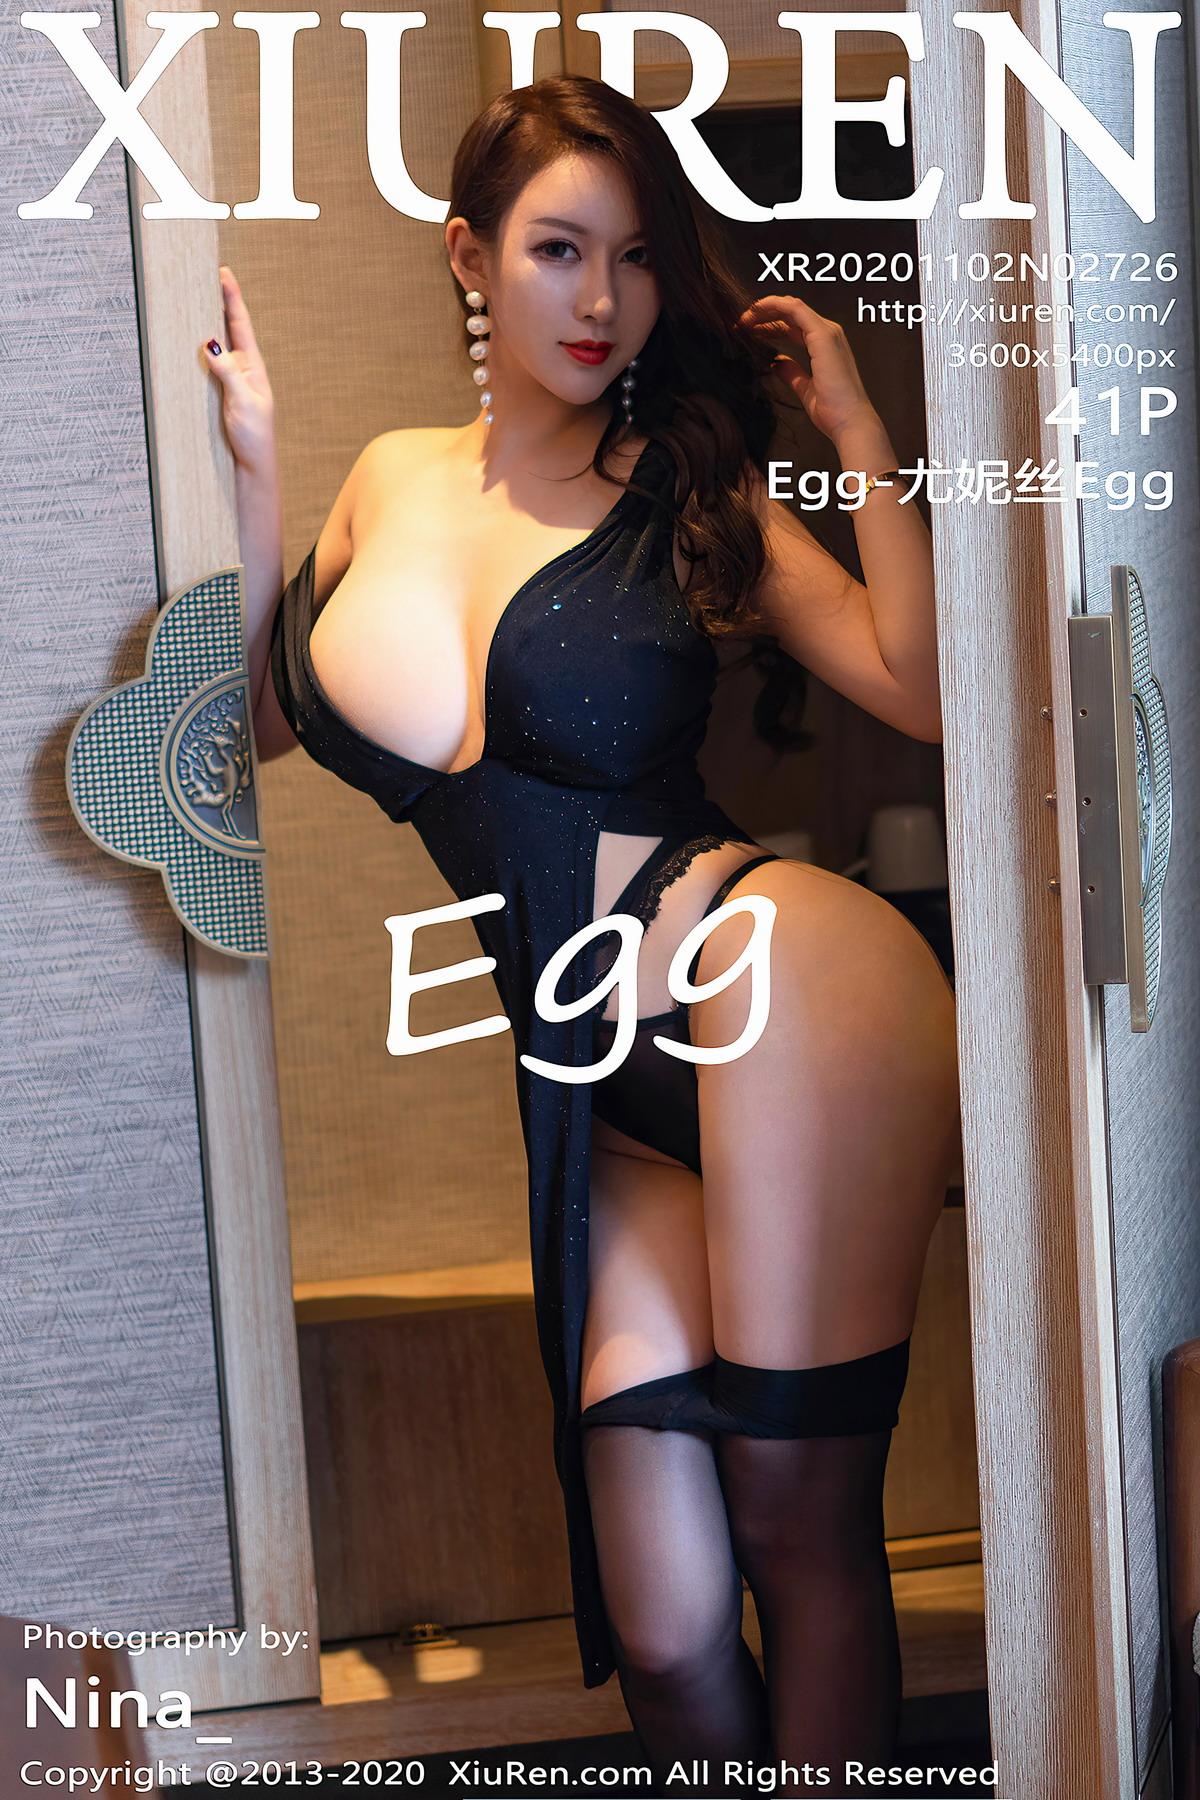 [Xiuren秀人网]2020.11.02 NO.2726 Egg-尤妮丝Egg[/429MB]